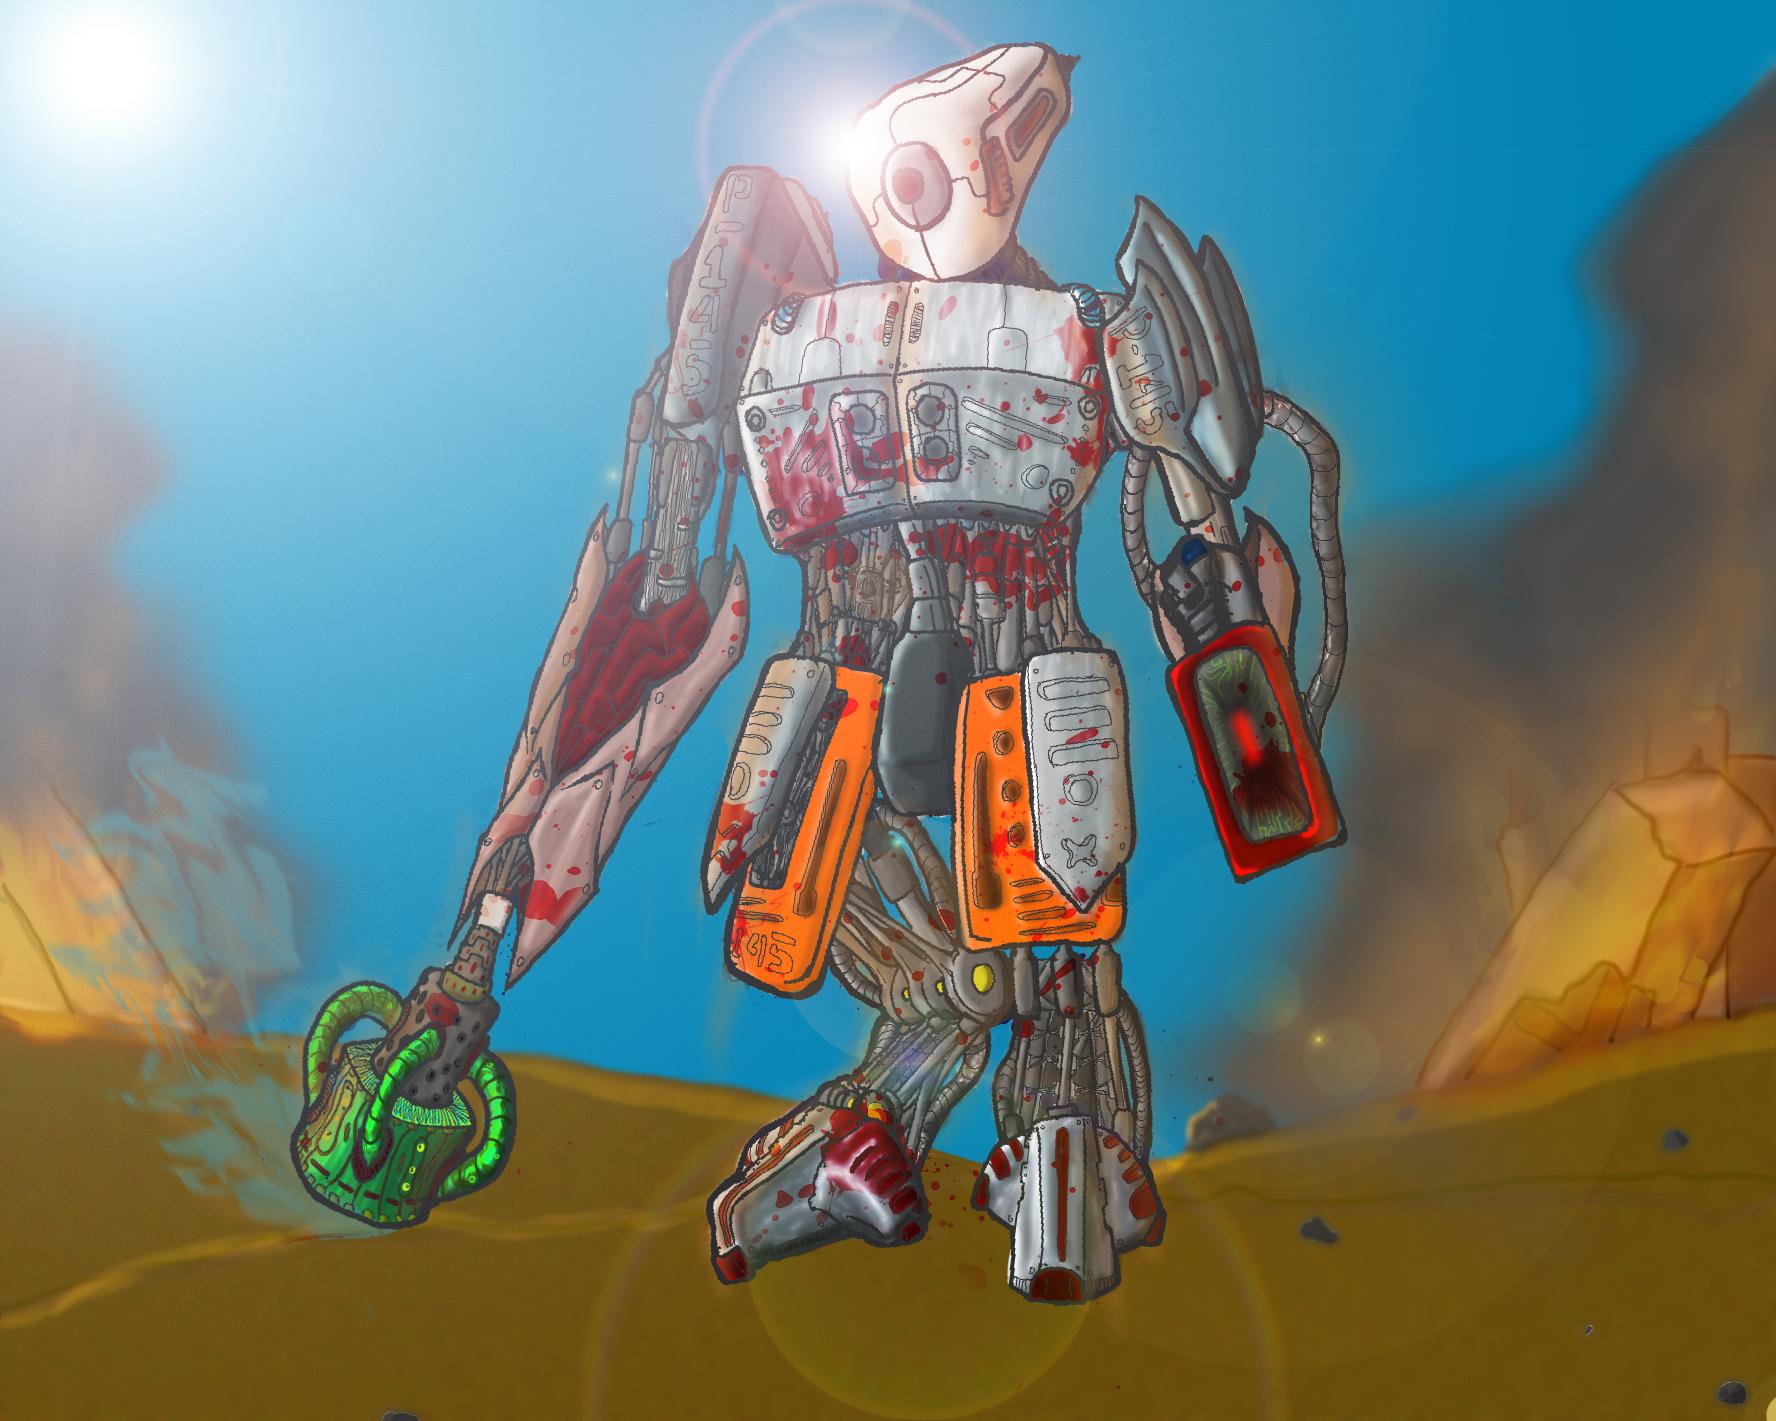 Killing Robot